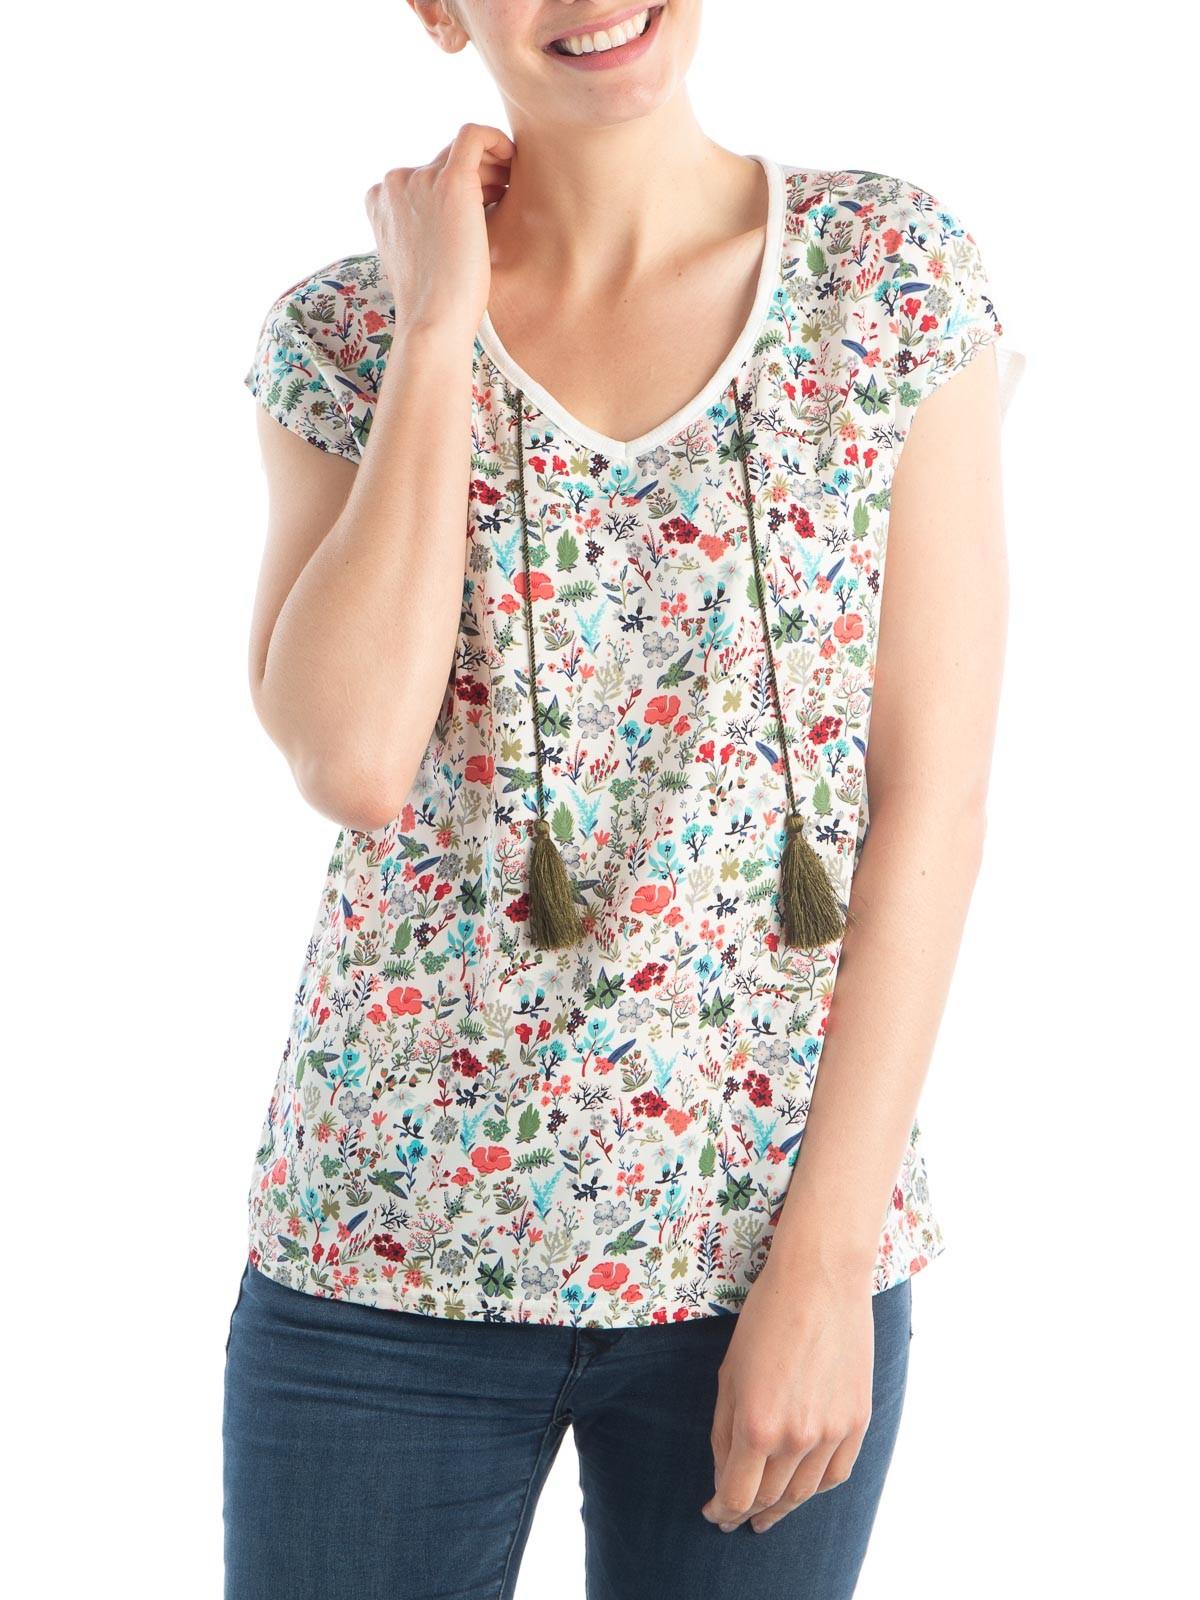 tee-shirt fleuri grande taille femme